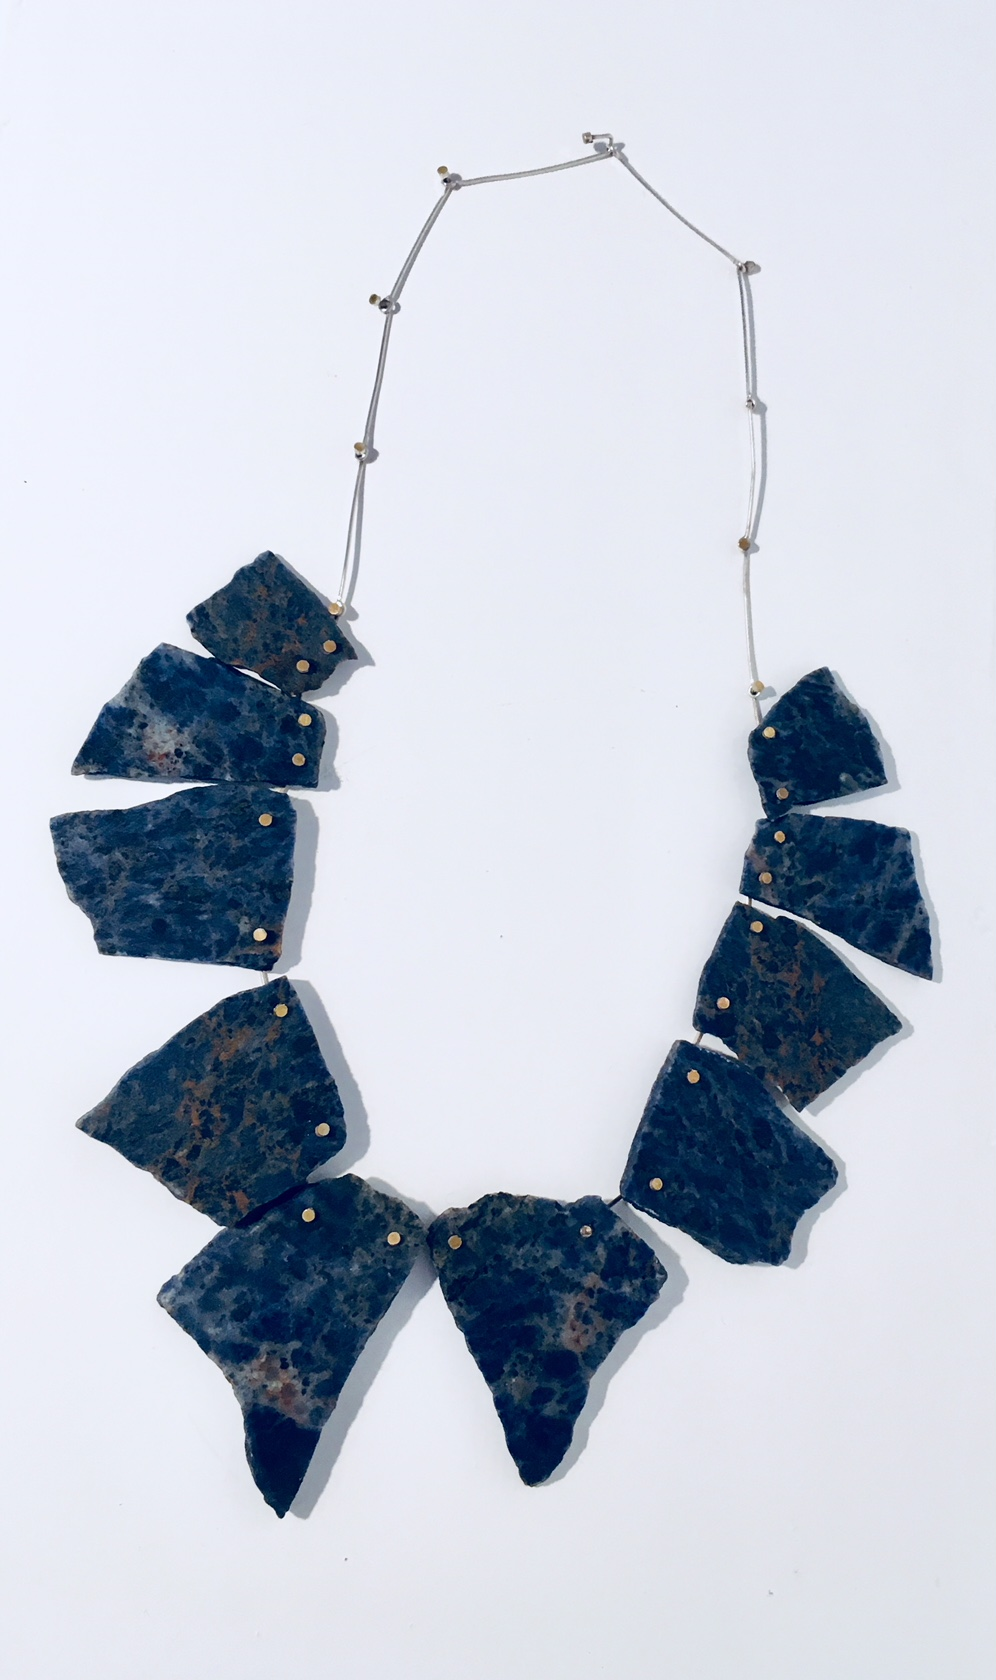 Lapis Lazuli Articulated Neckpiece